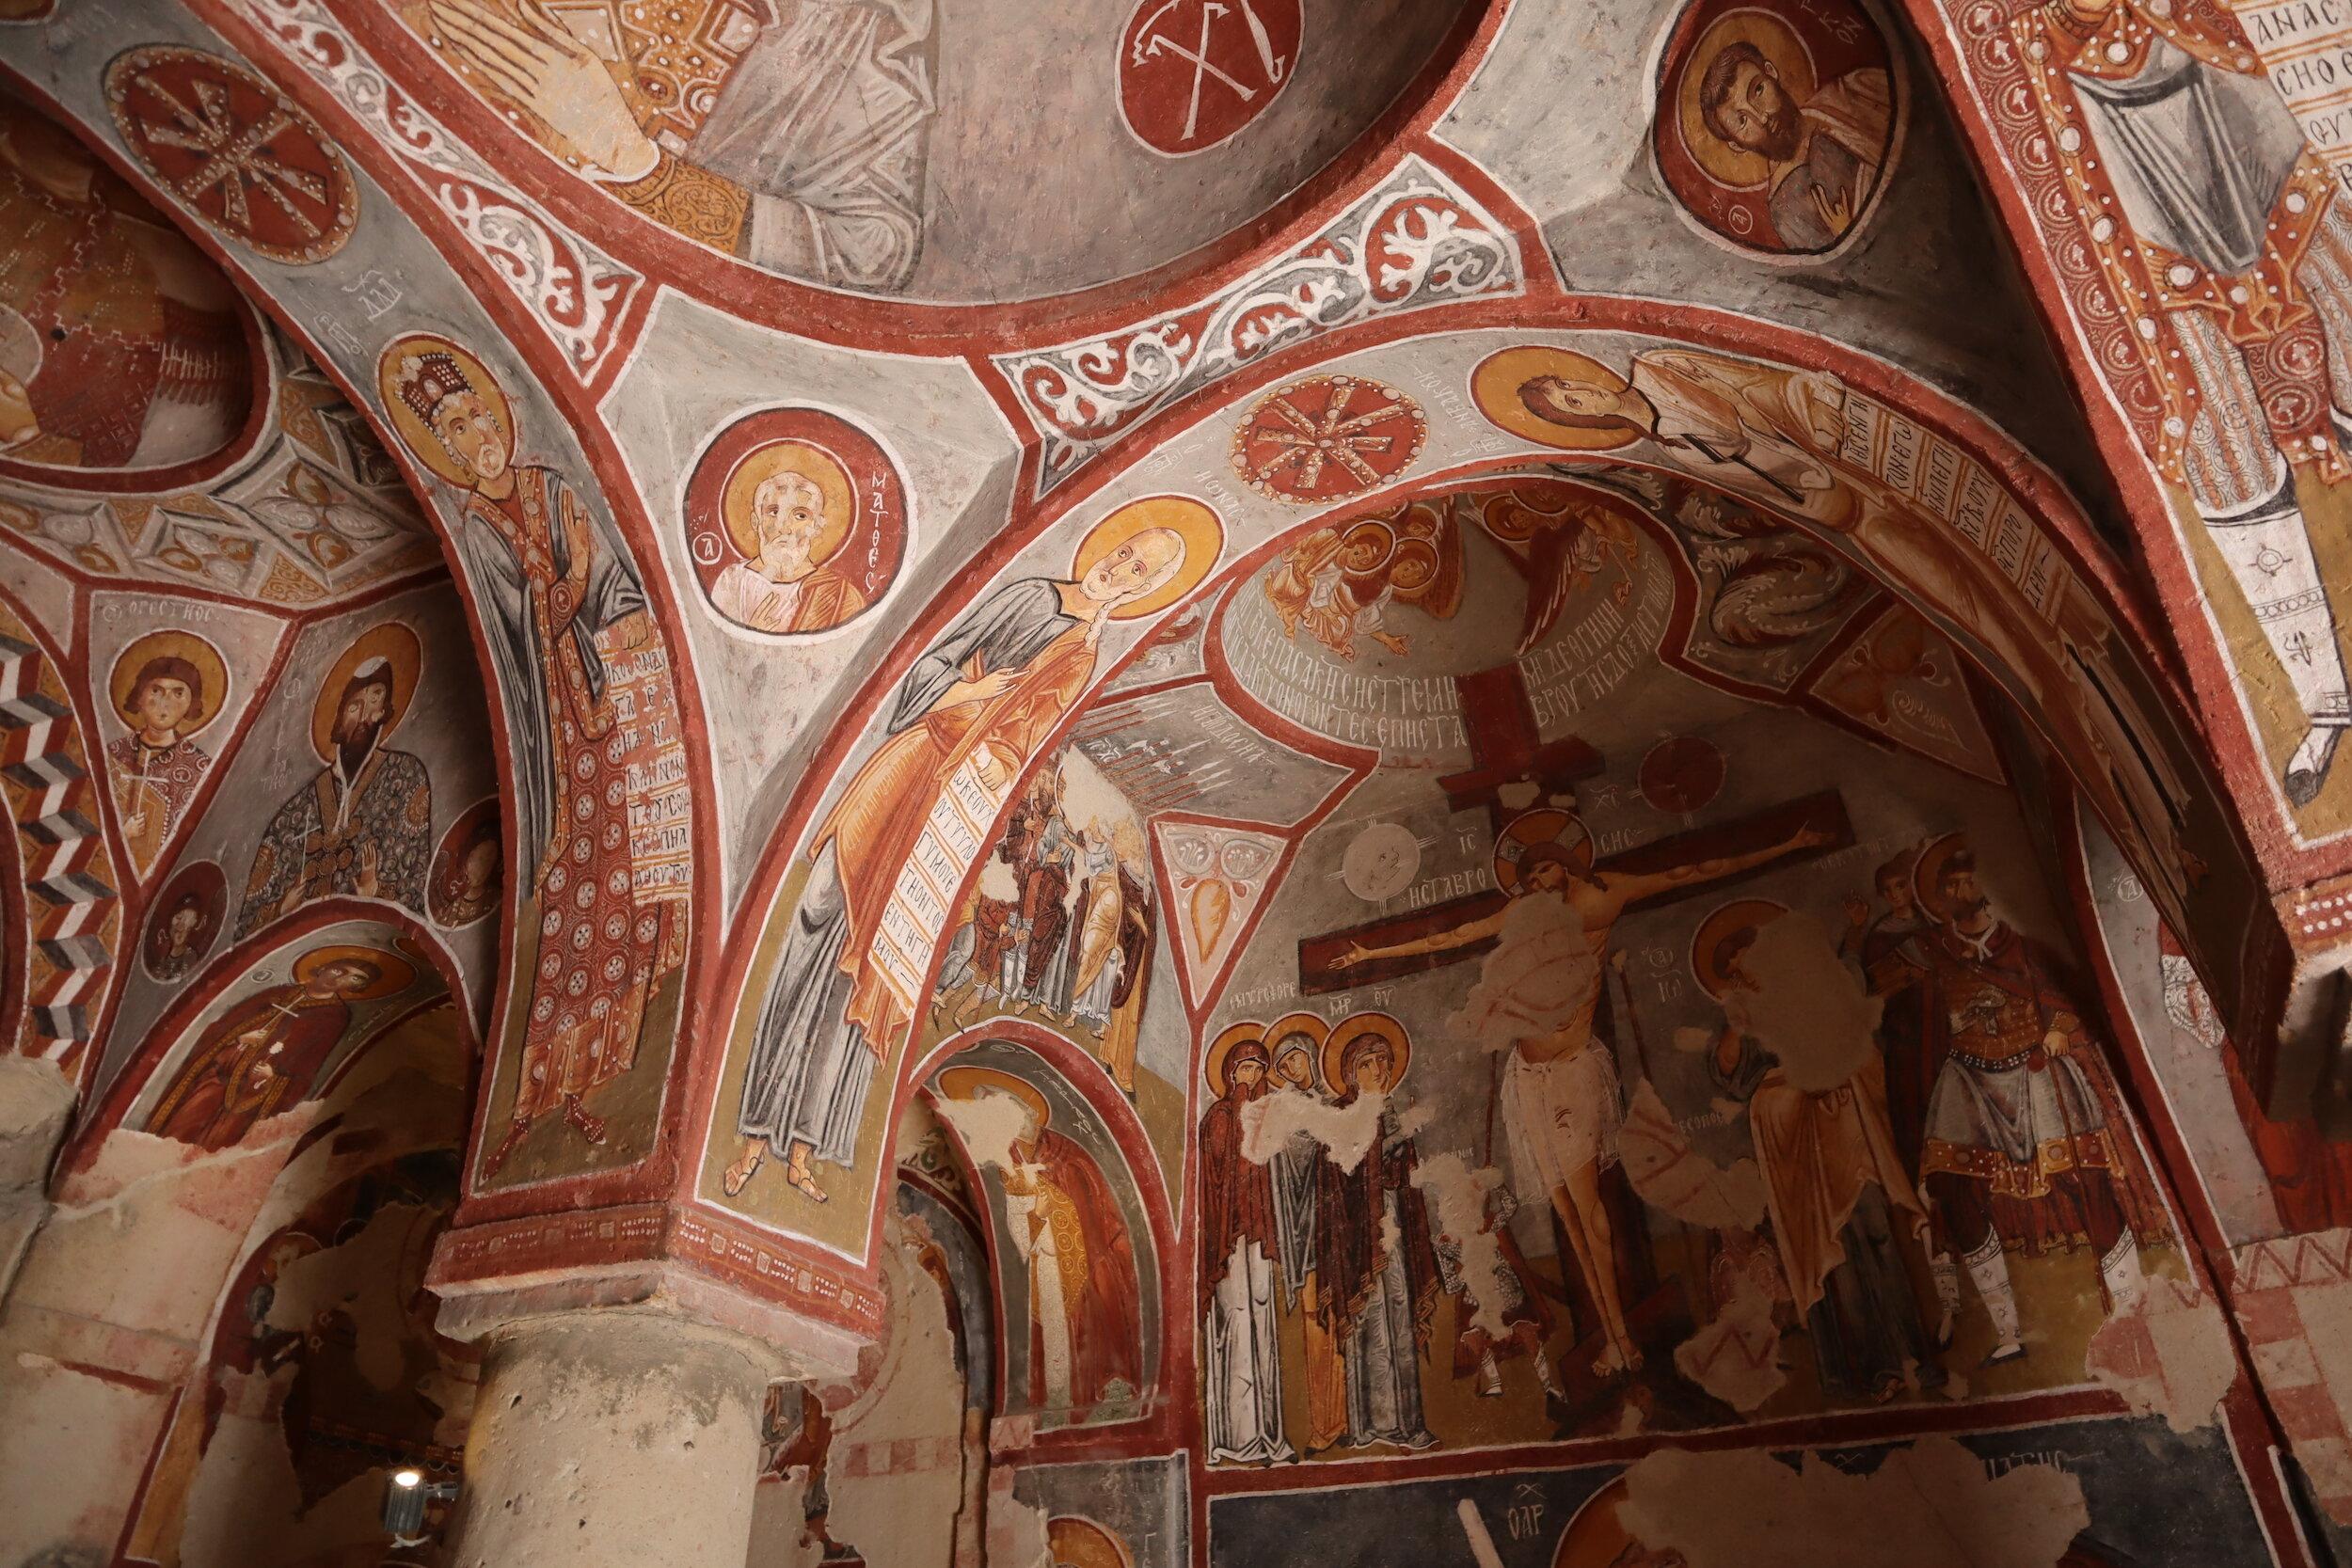 Göreme Open Air Museum – Rock-cut churches